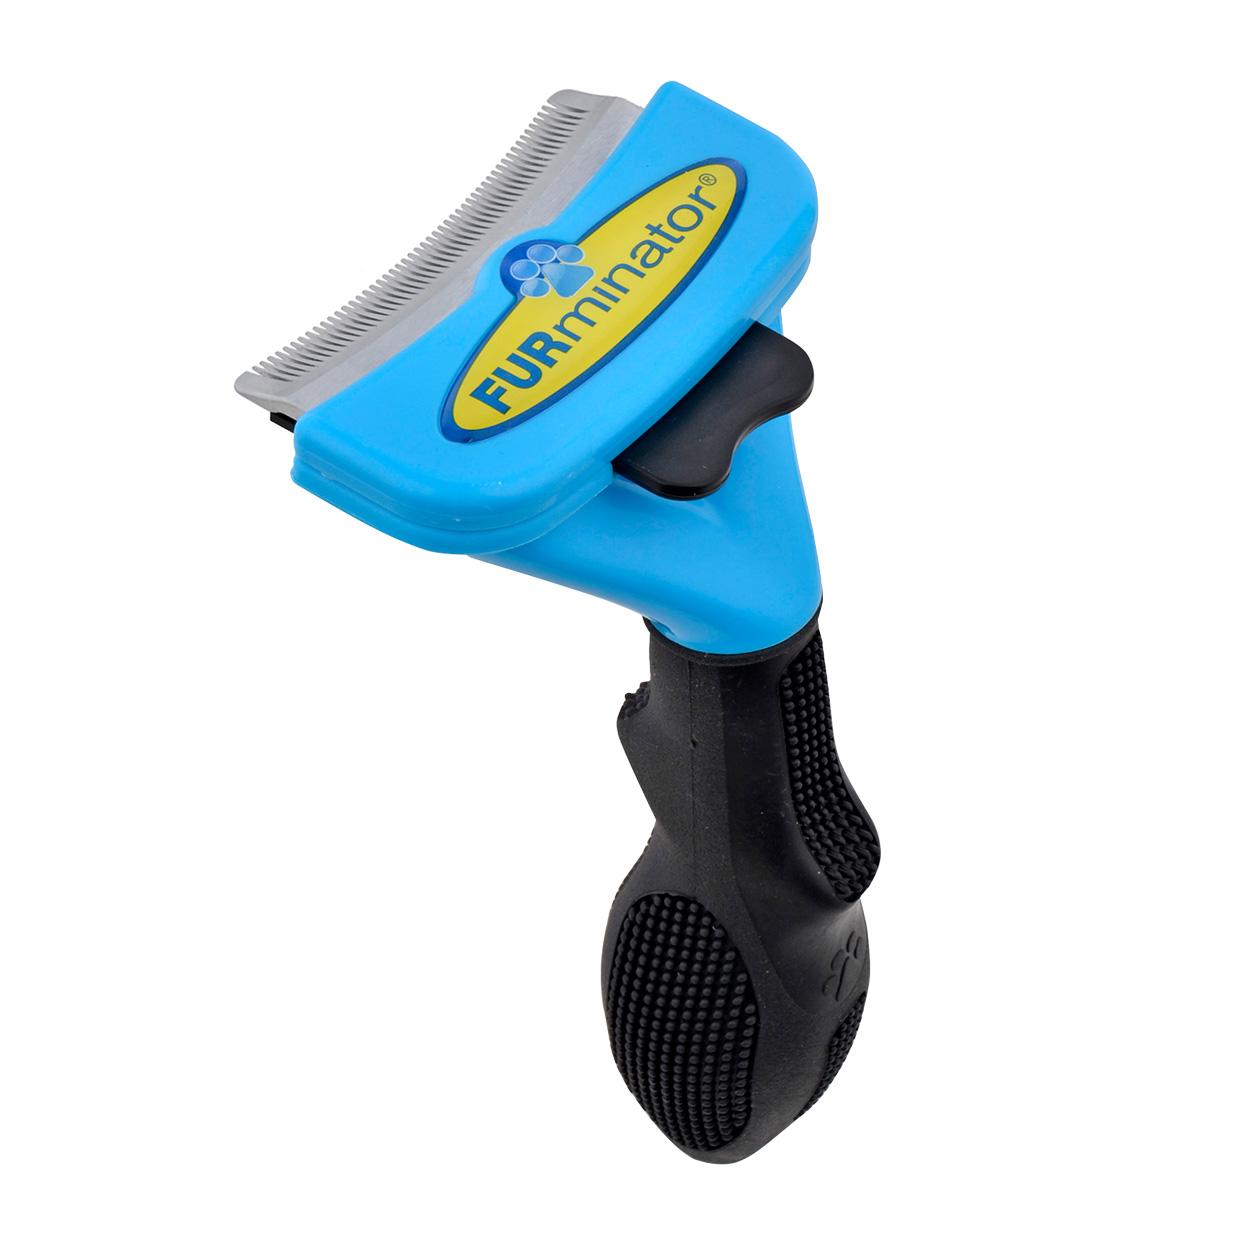 FURminator Comfort Edge deShedding Tool - Small 11094